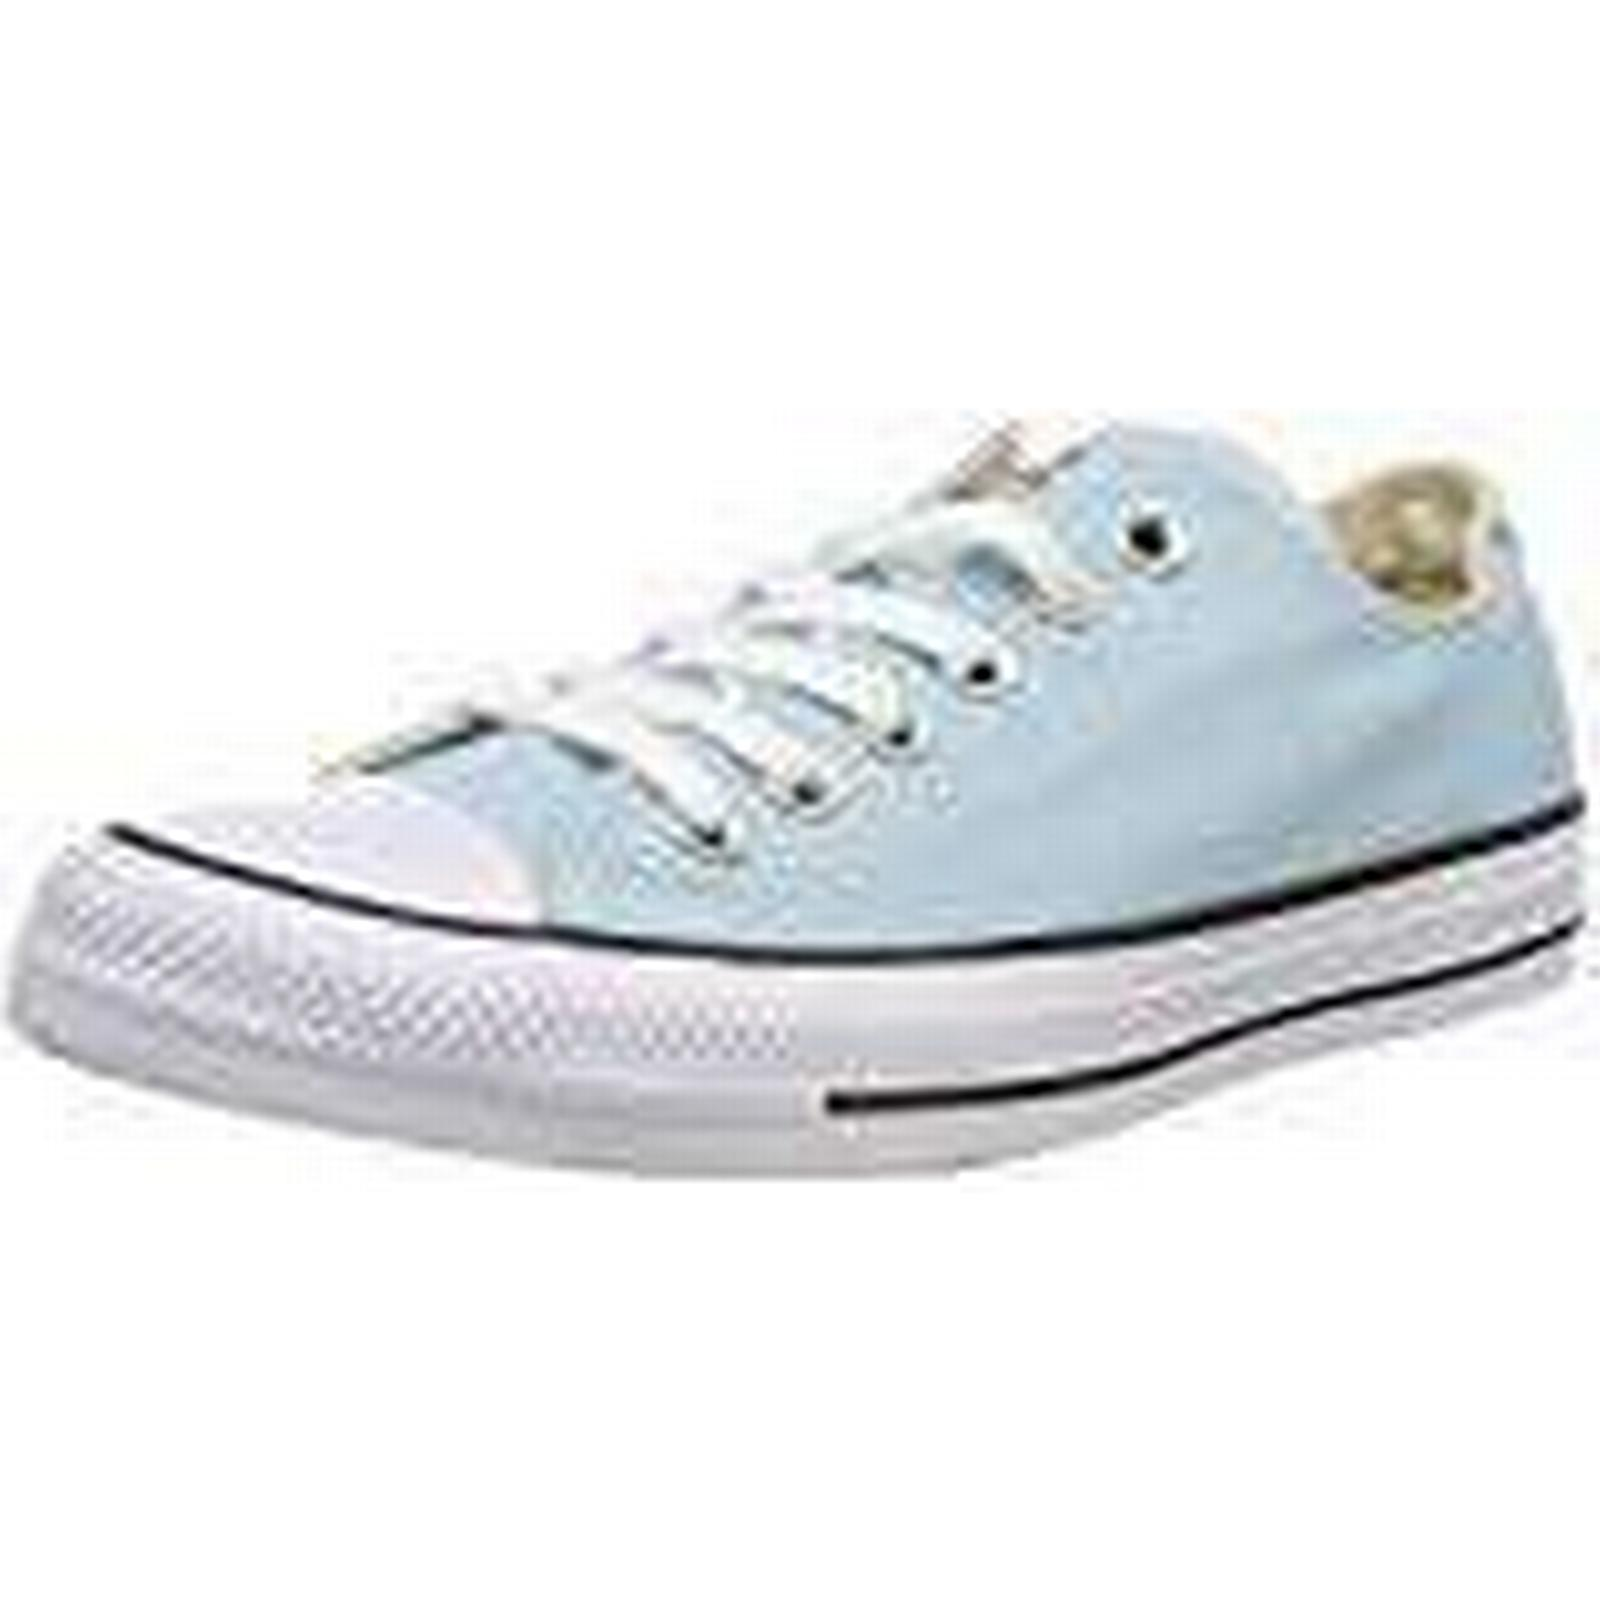 Converse 456), Unisex Adults' CTAS OX Trainers, Blue (Ocean Bliss 456), Converse 4 UK 4 UK de1191